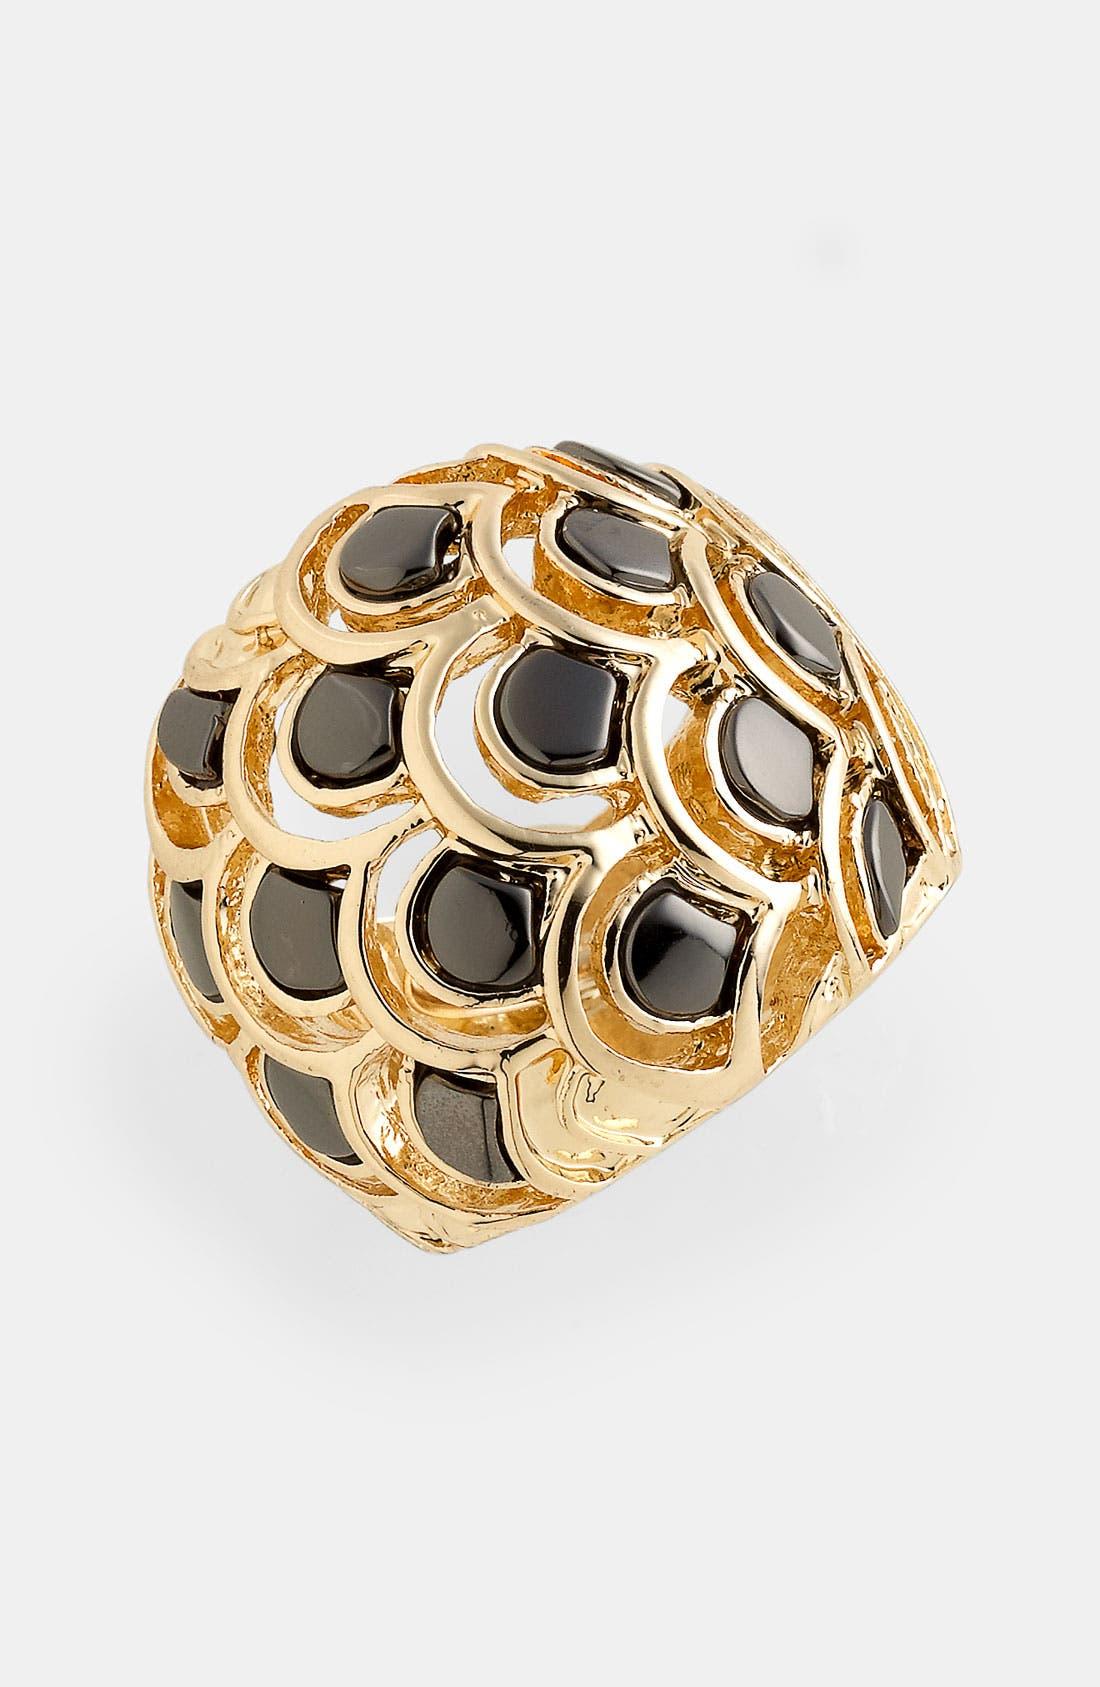 Main Image - Spring Street Design Group Metal Scales Ring